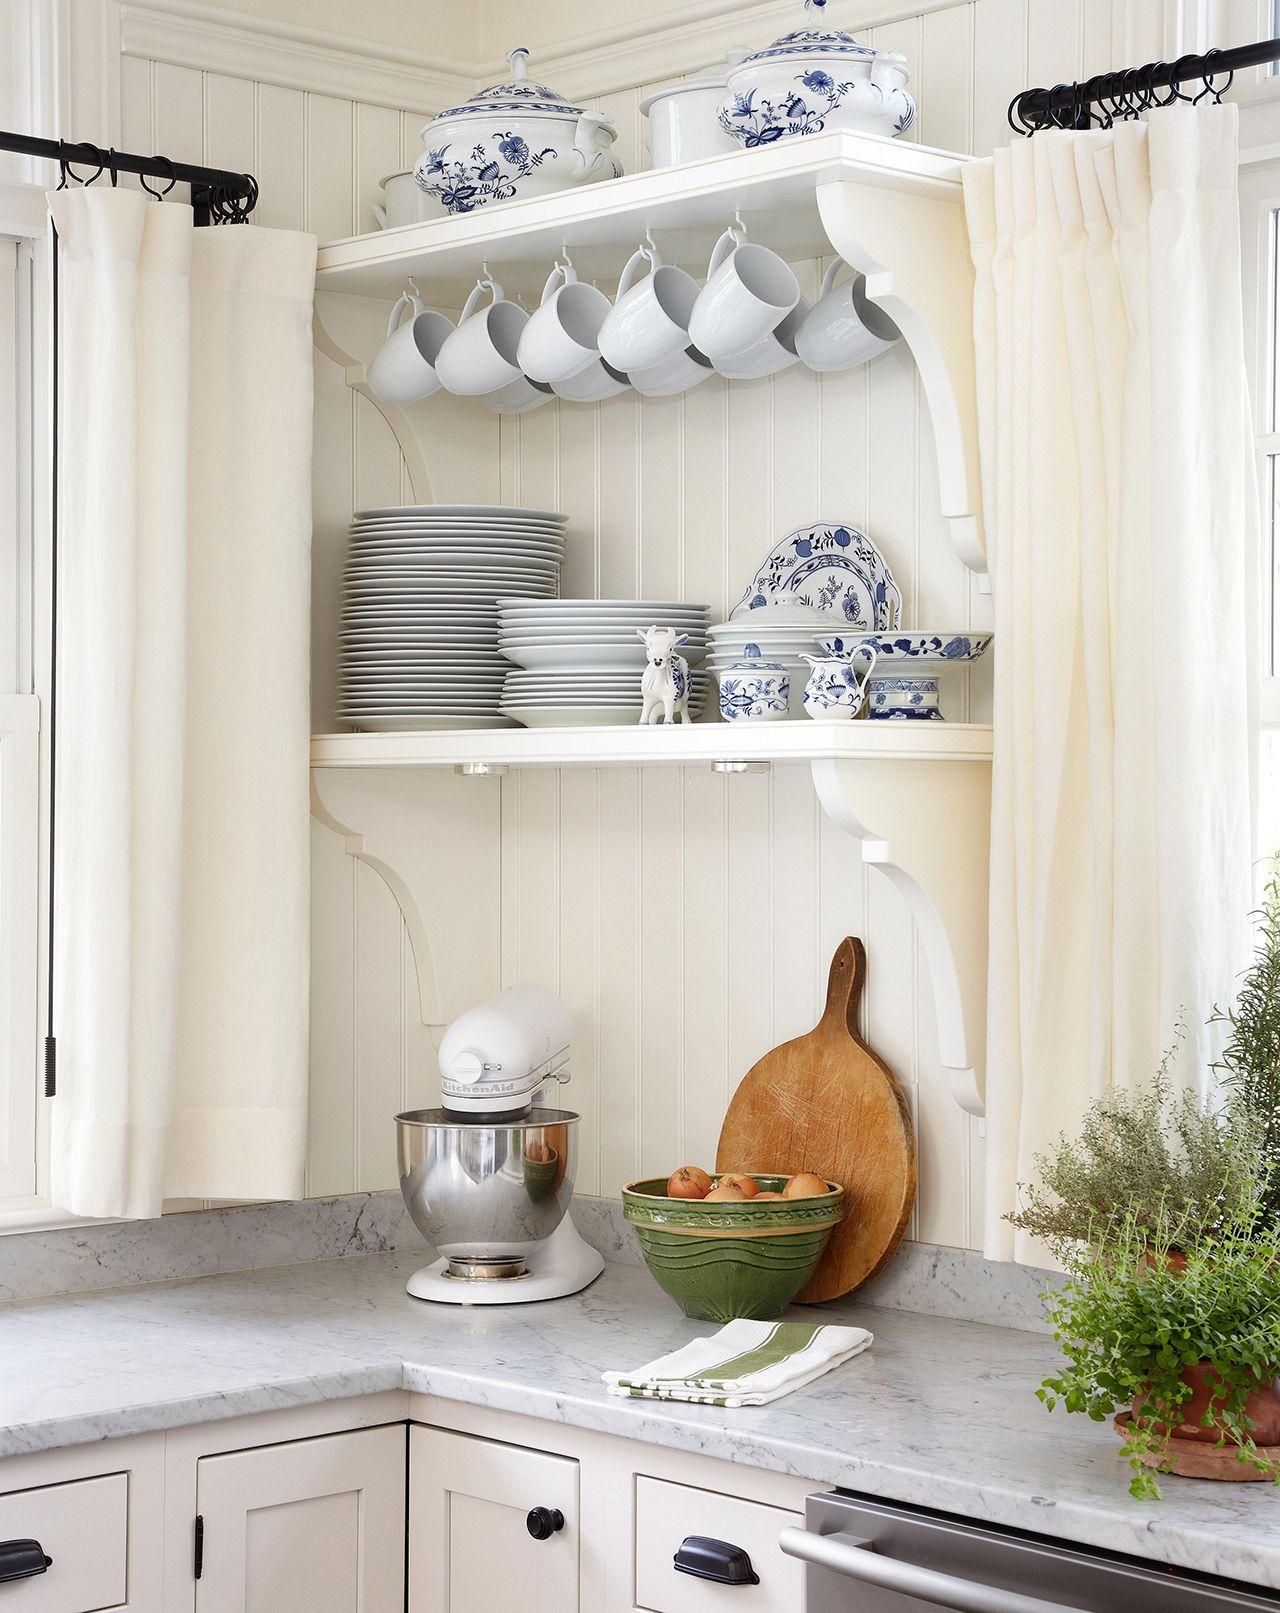 31 Creative Ways To Store Dishes And Utensils That Go Beyond Cabinetry In 2020 Kitchen Shelf Design Kitchen Design Small Kitchen Decor